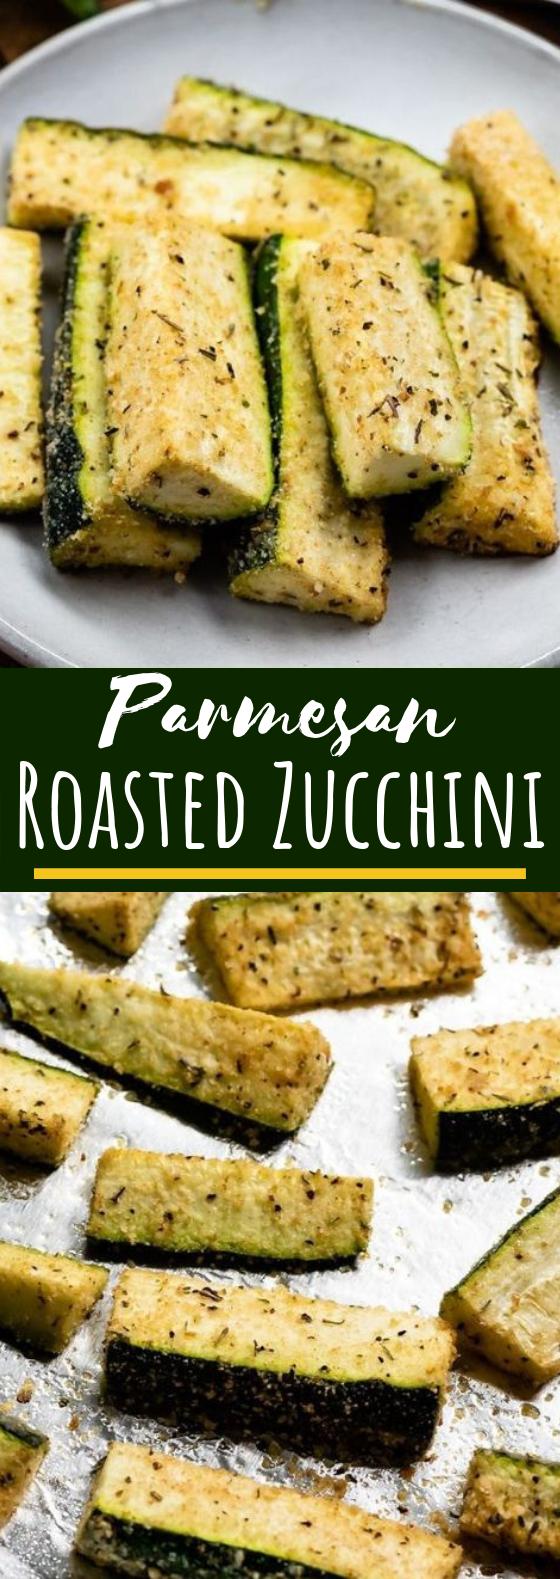 Parmesan Roasted Zucchini #healthy #vegetarian